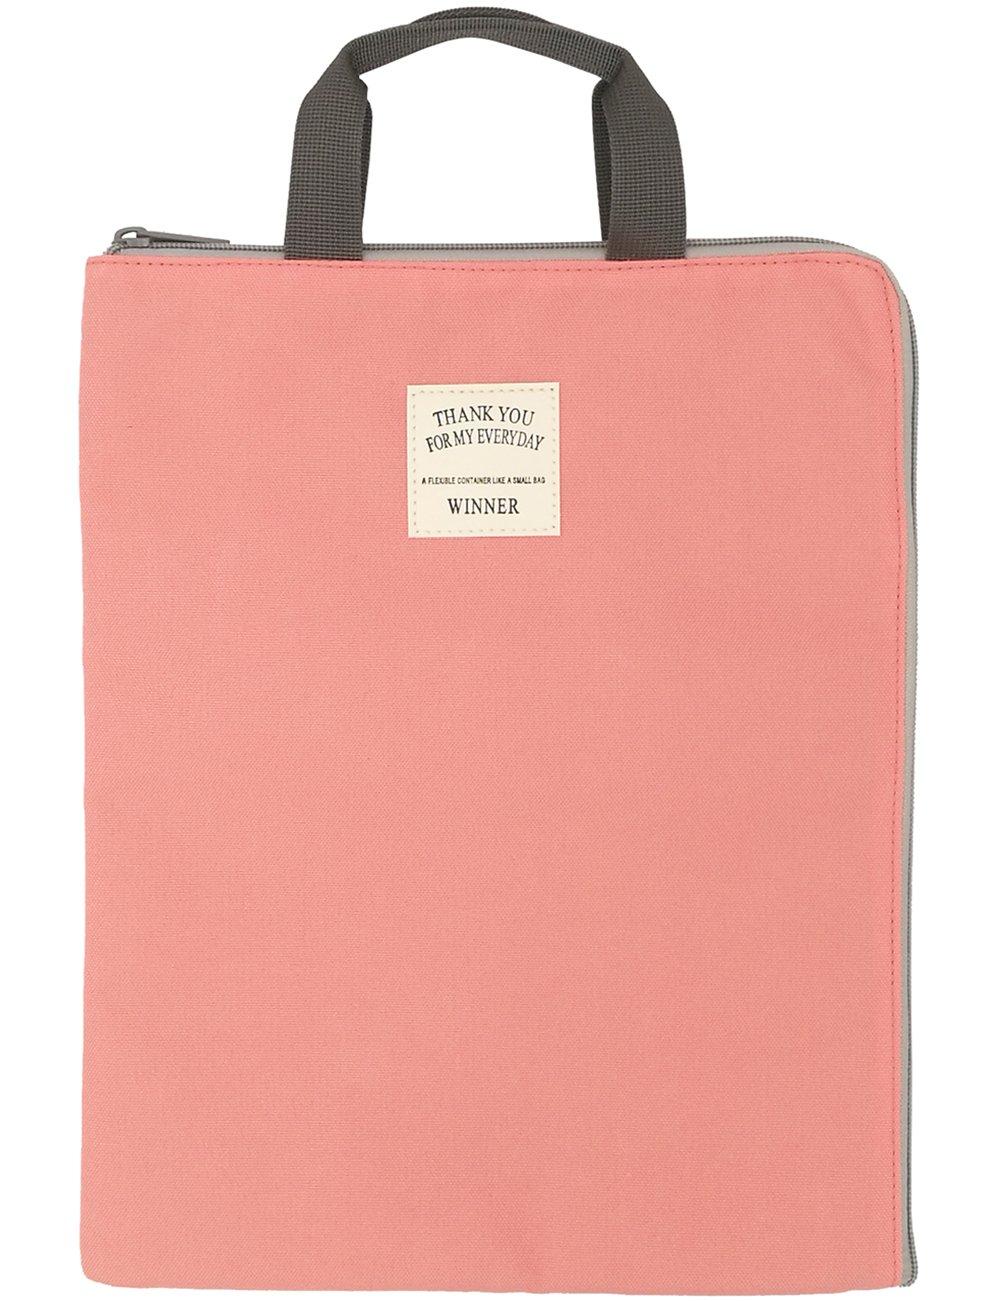 Mygreen A4 Size Paper File Folder Holder Top Handle Business Briefcase Document Stationery Supplies Bag Organizer Pen Case Office School Handbag Tote Purse